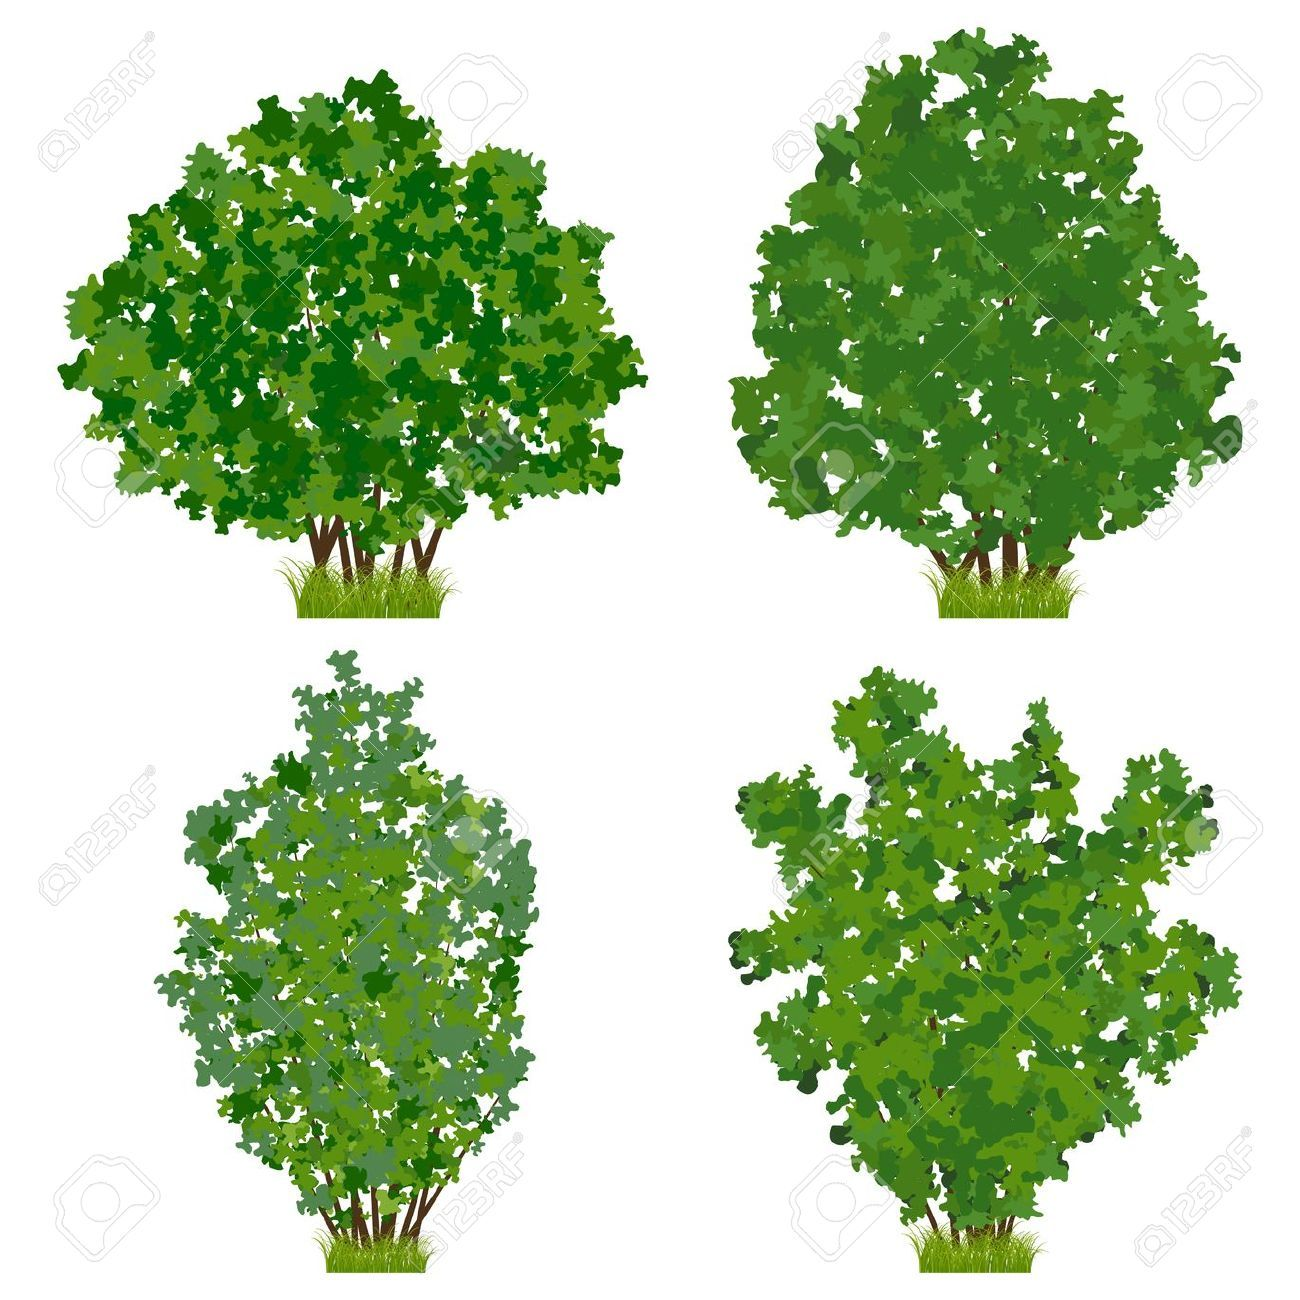 Shrub google search food forests pinterest shrub for Arbustos de jardin